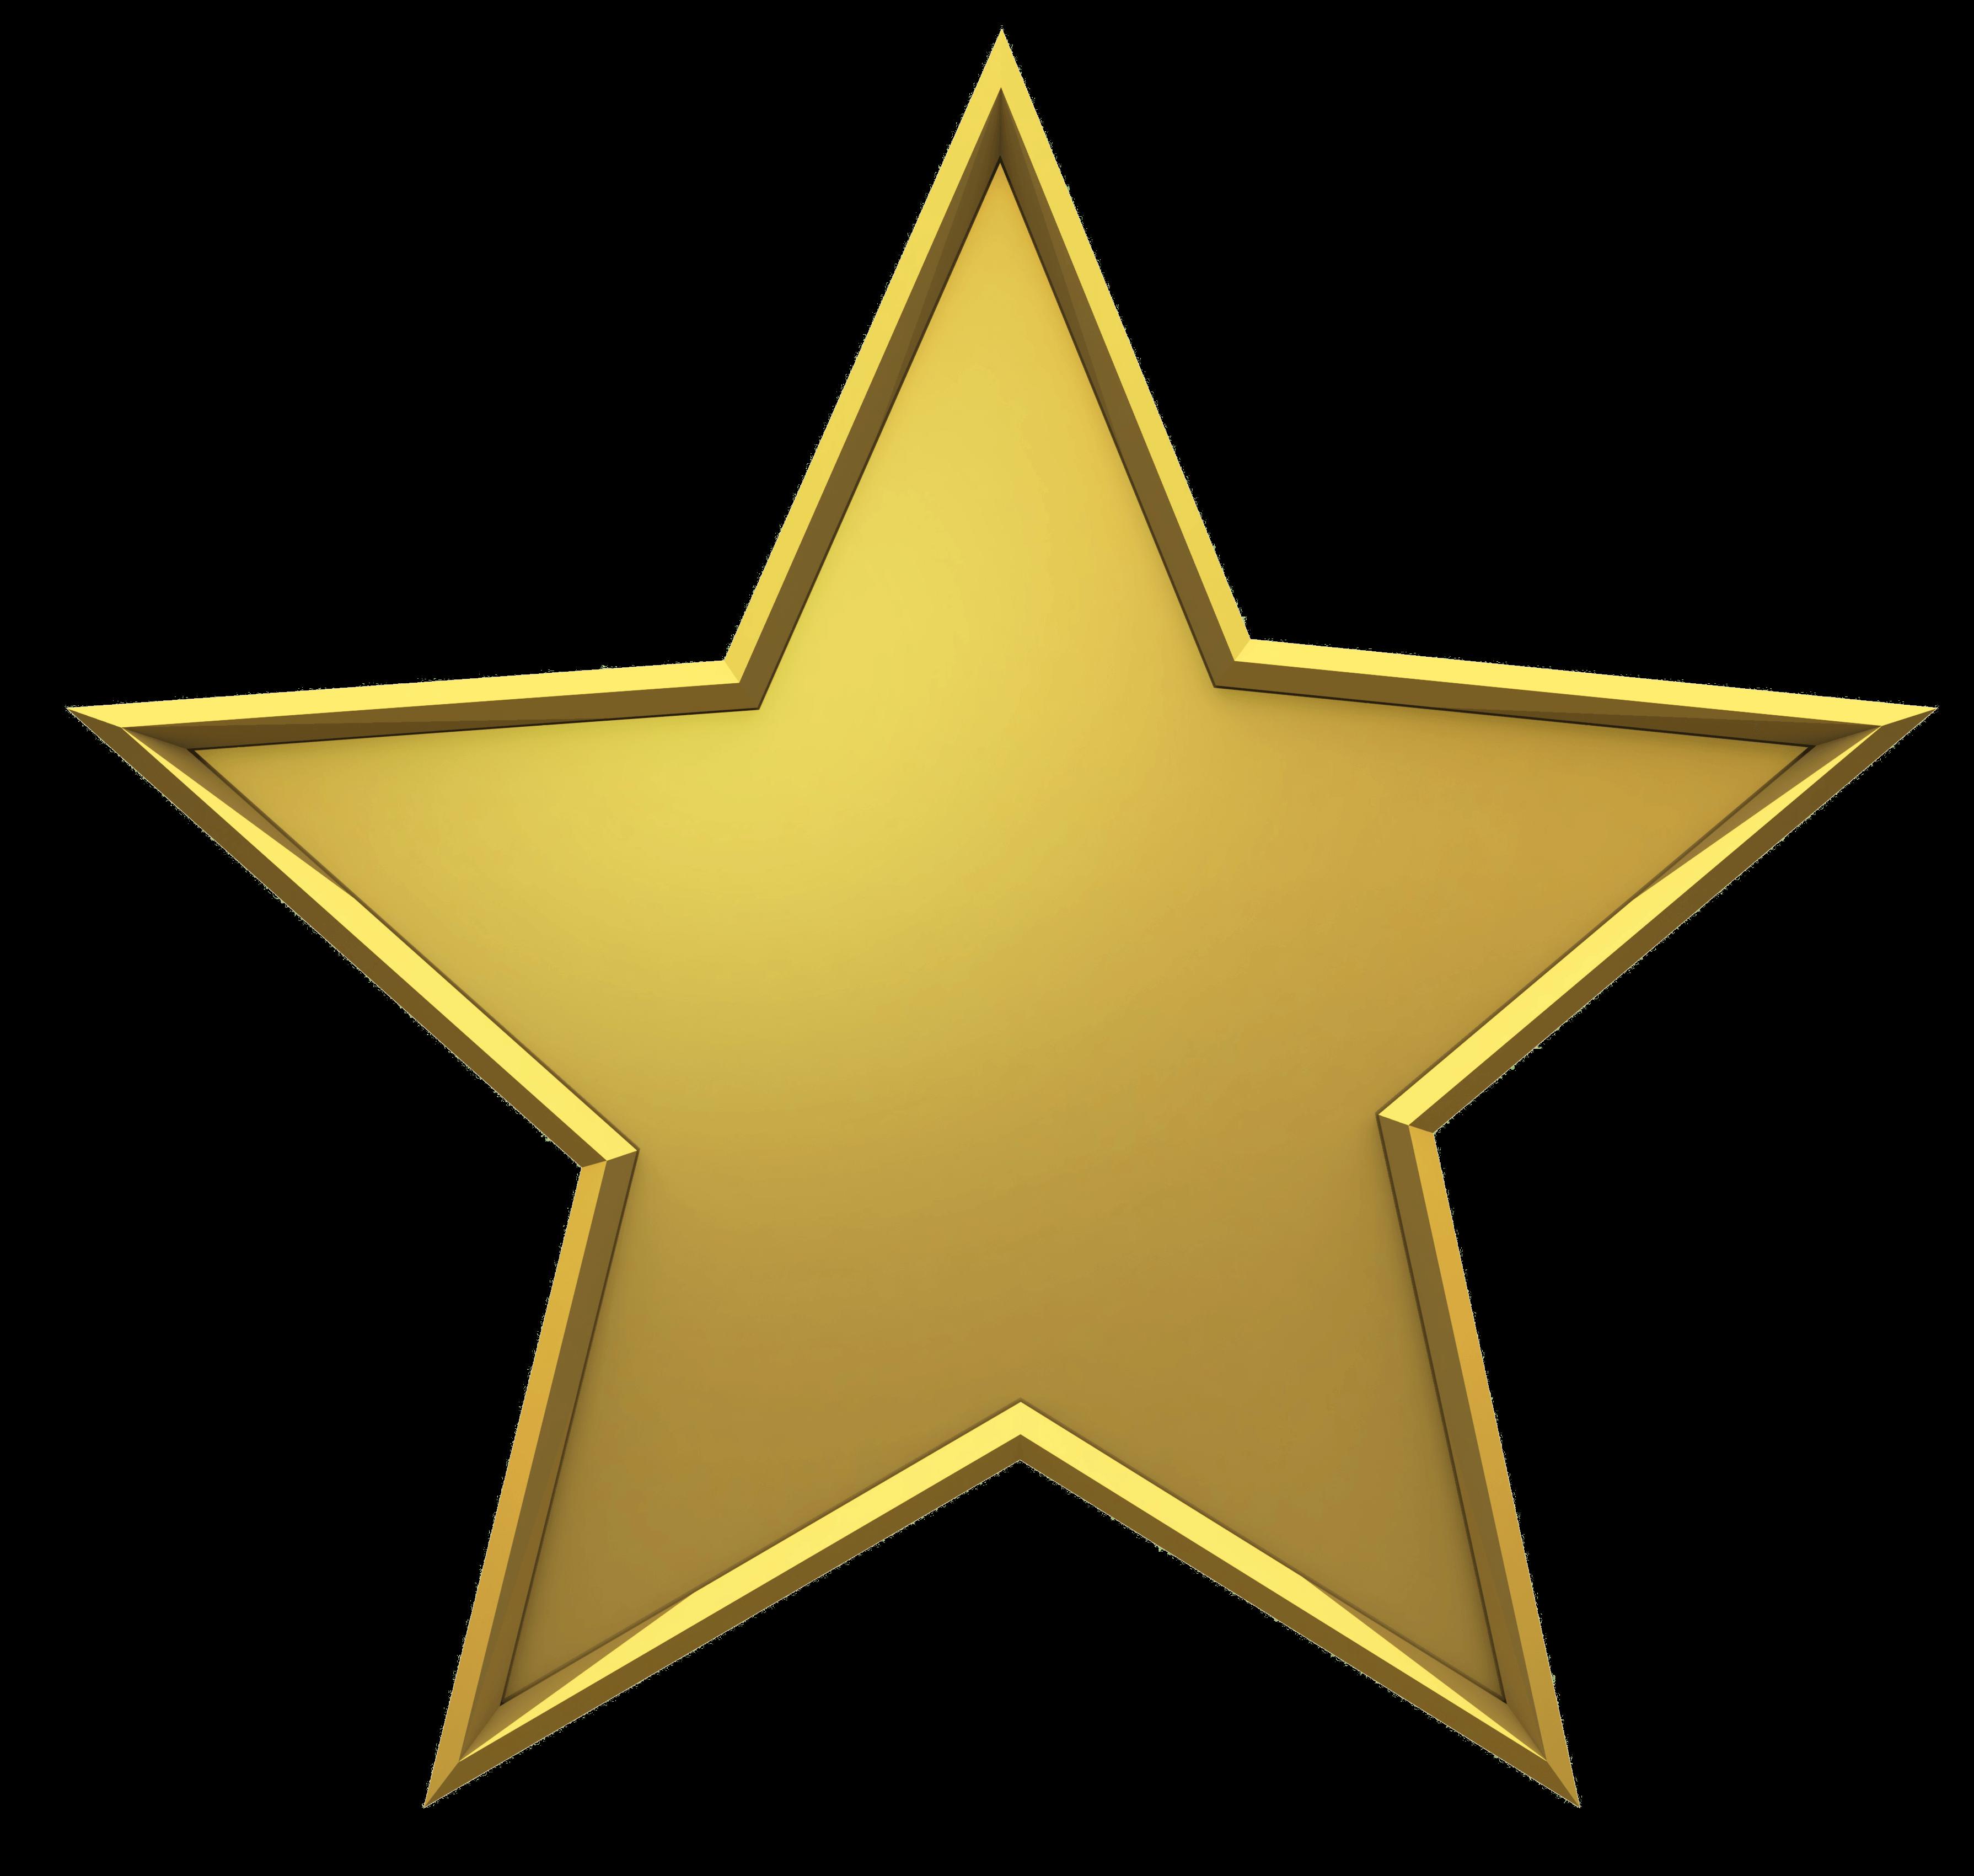 Star Clipart Yellow Five Pointed Star Five Arrangement 5 Stars Golden Five Stars Five Pointed Star 5 Stars G In 2021 Star Clipart Star Logo Design Apple Logo Wallpaper